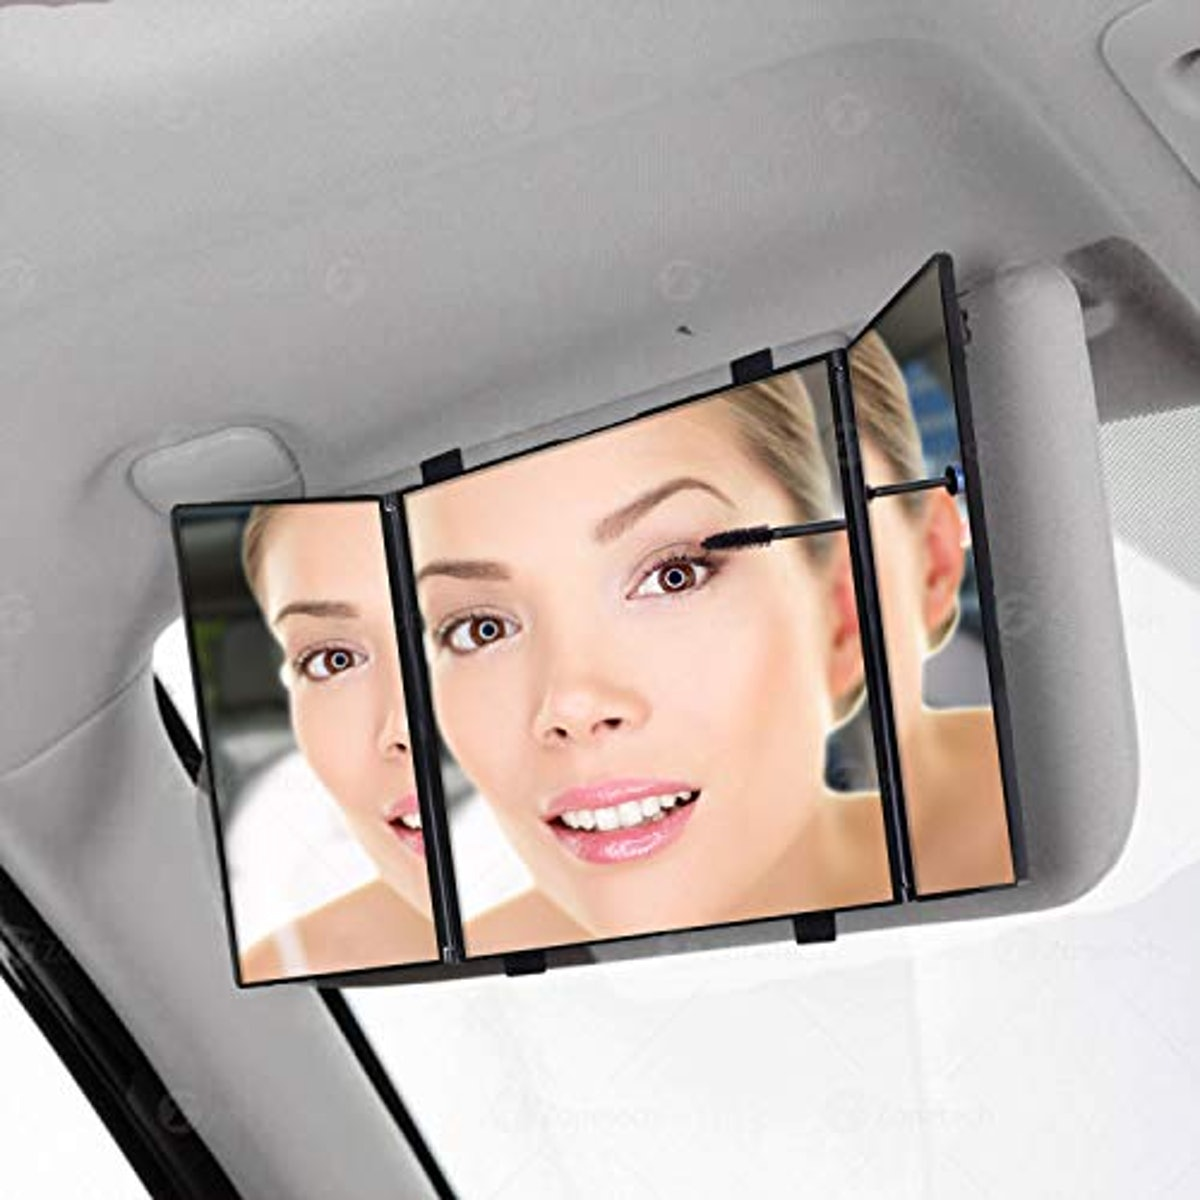 Comfort Wheels Car Folding Visor Vanity Mirror